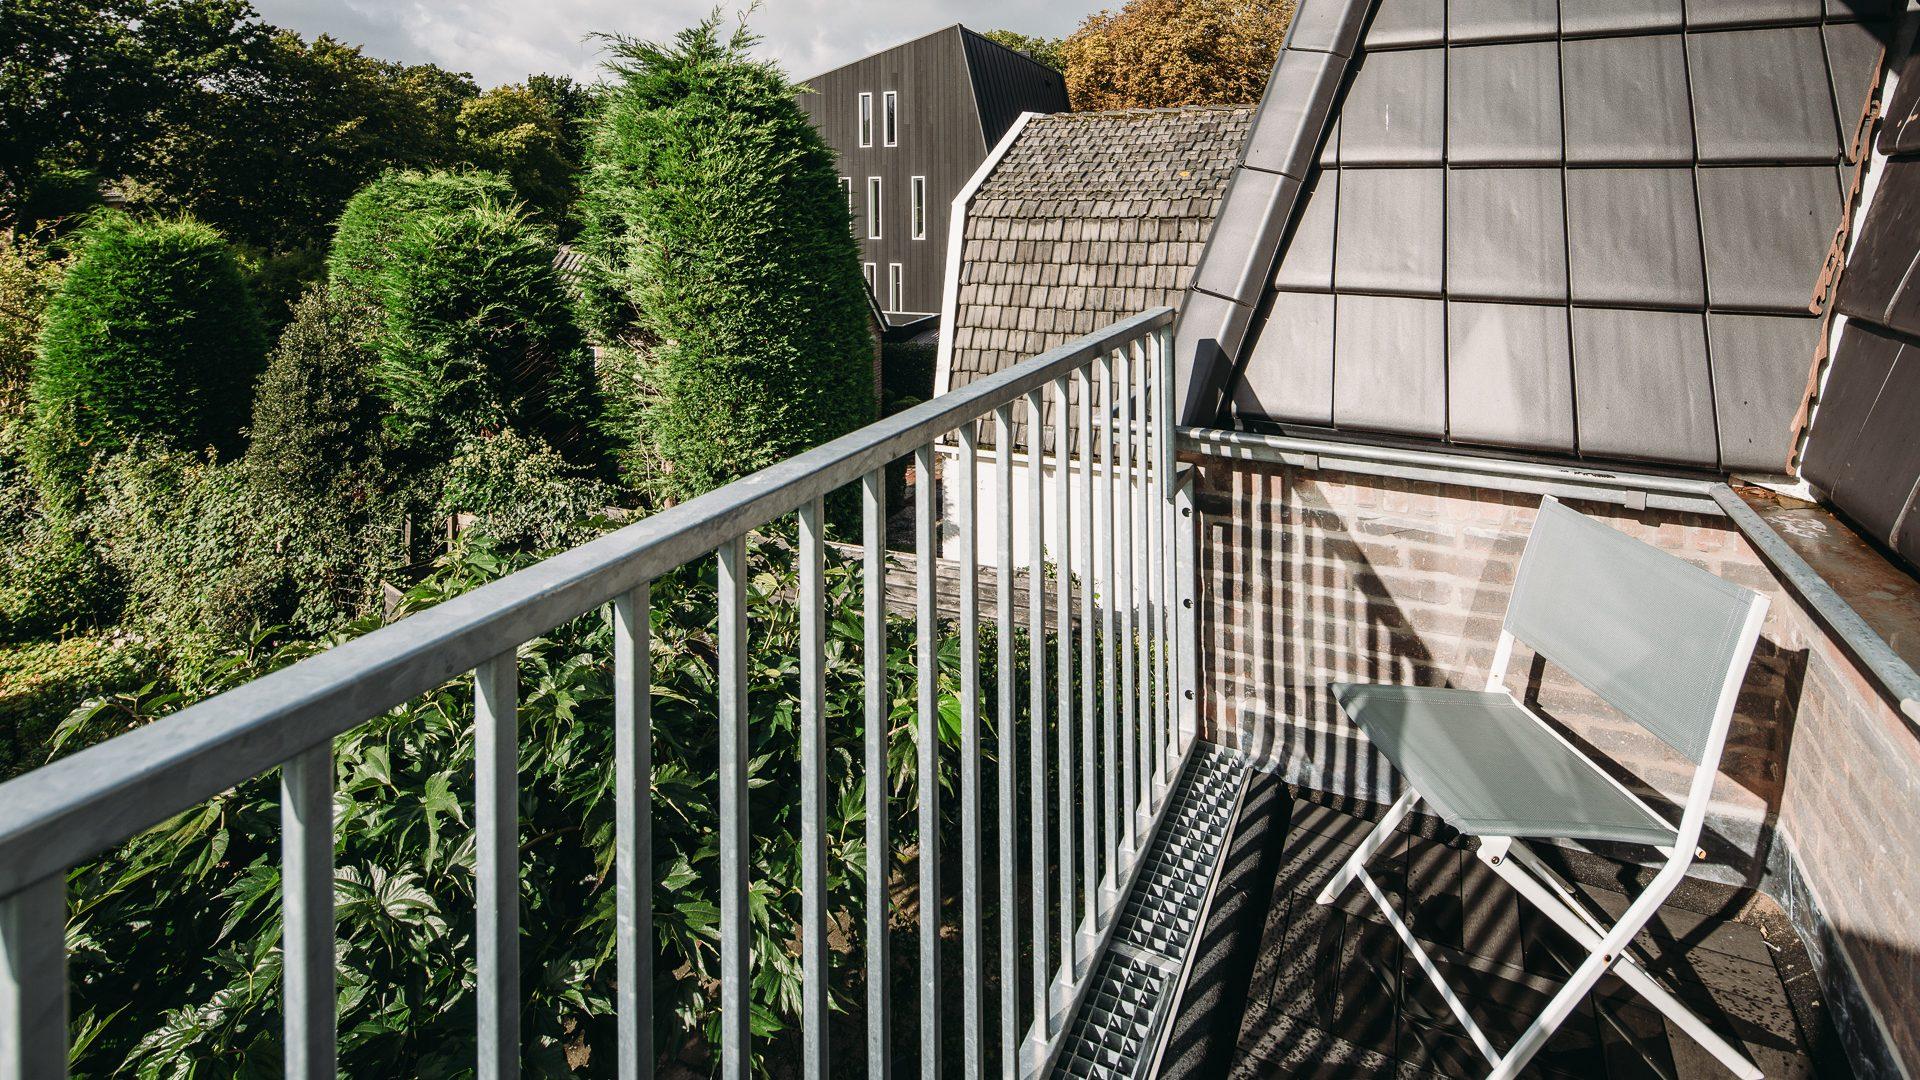 evabloem_lumen_balkonappartement-021